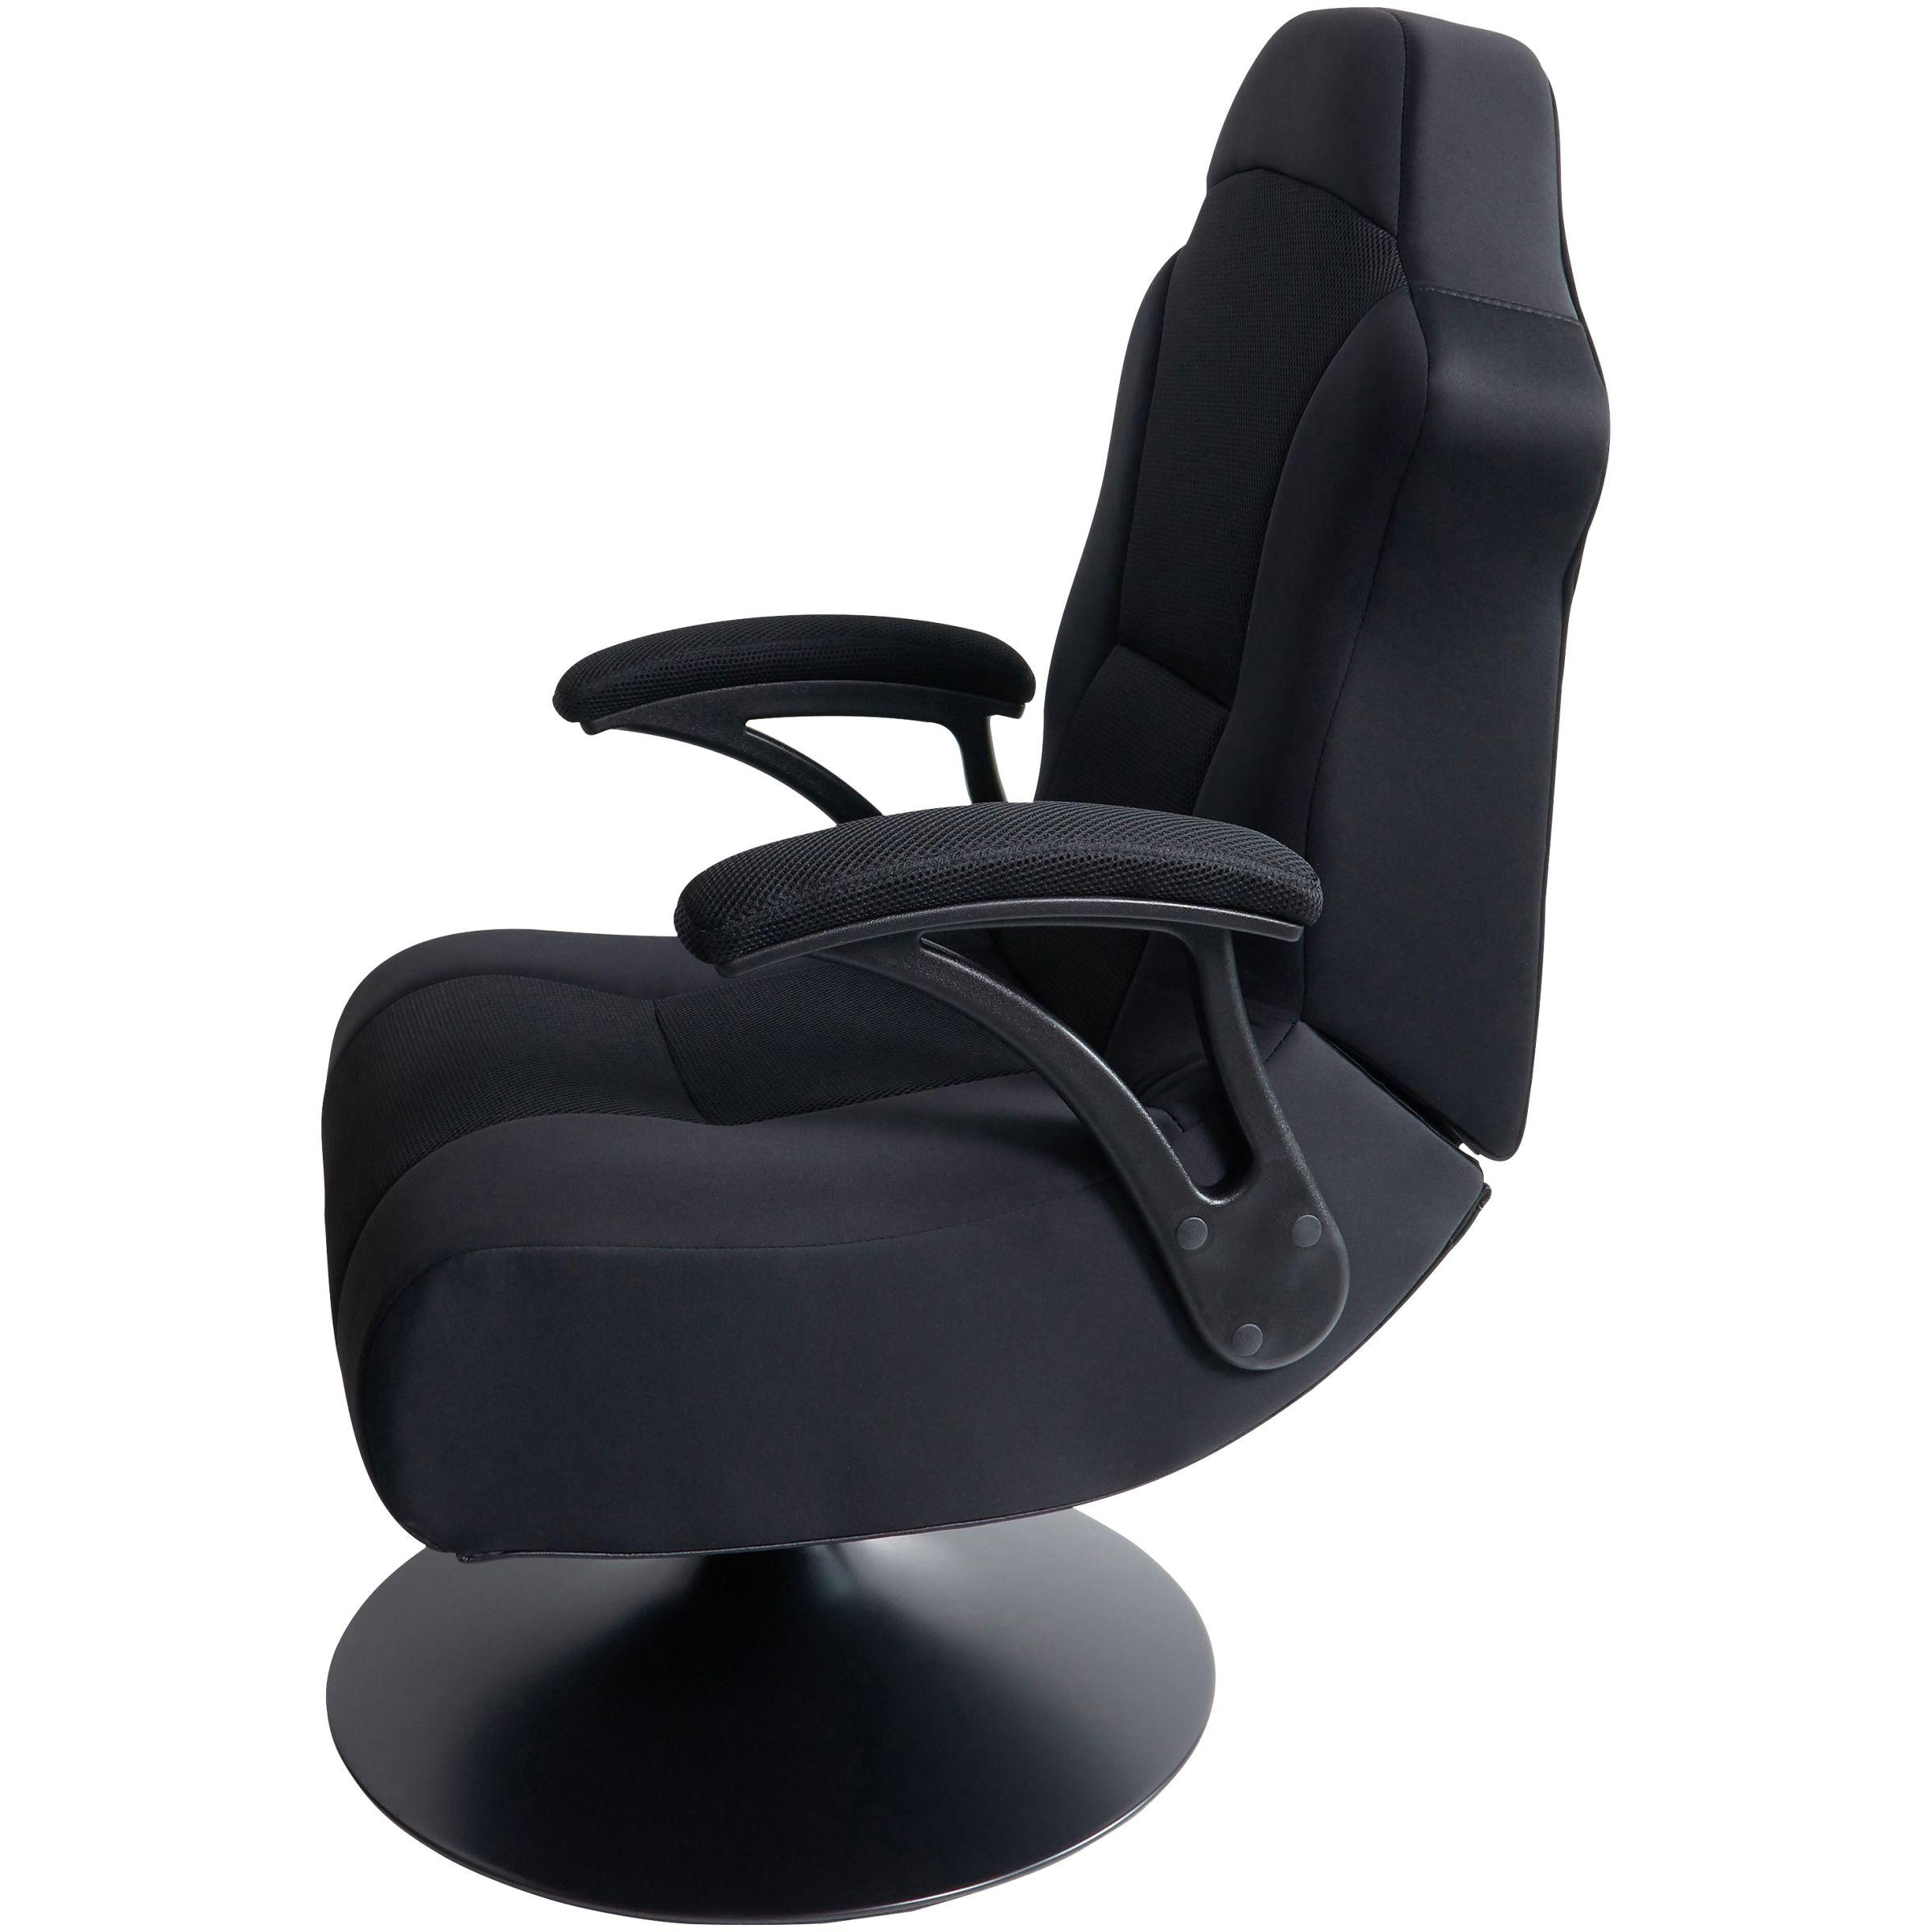 X Rocker X Pro 300 Black Pedestal Gaming Chair Rocker With Built